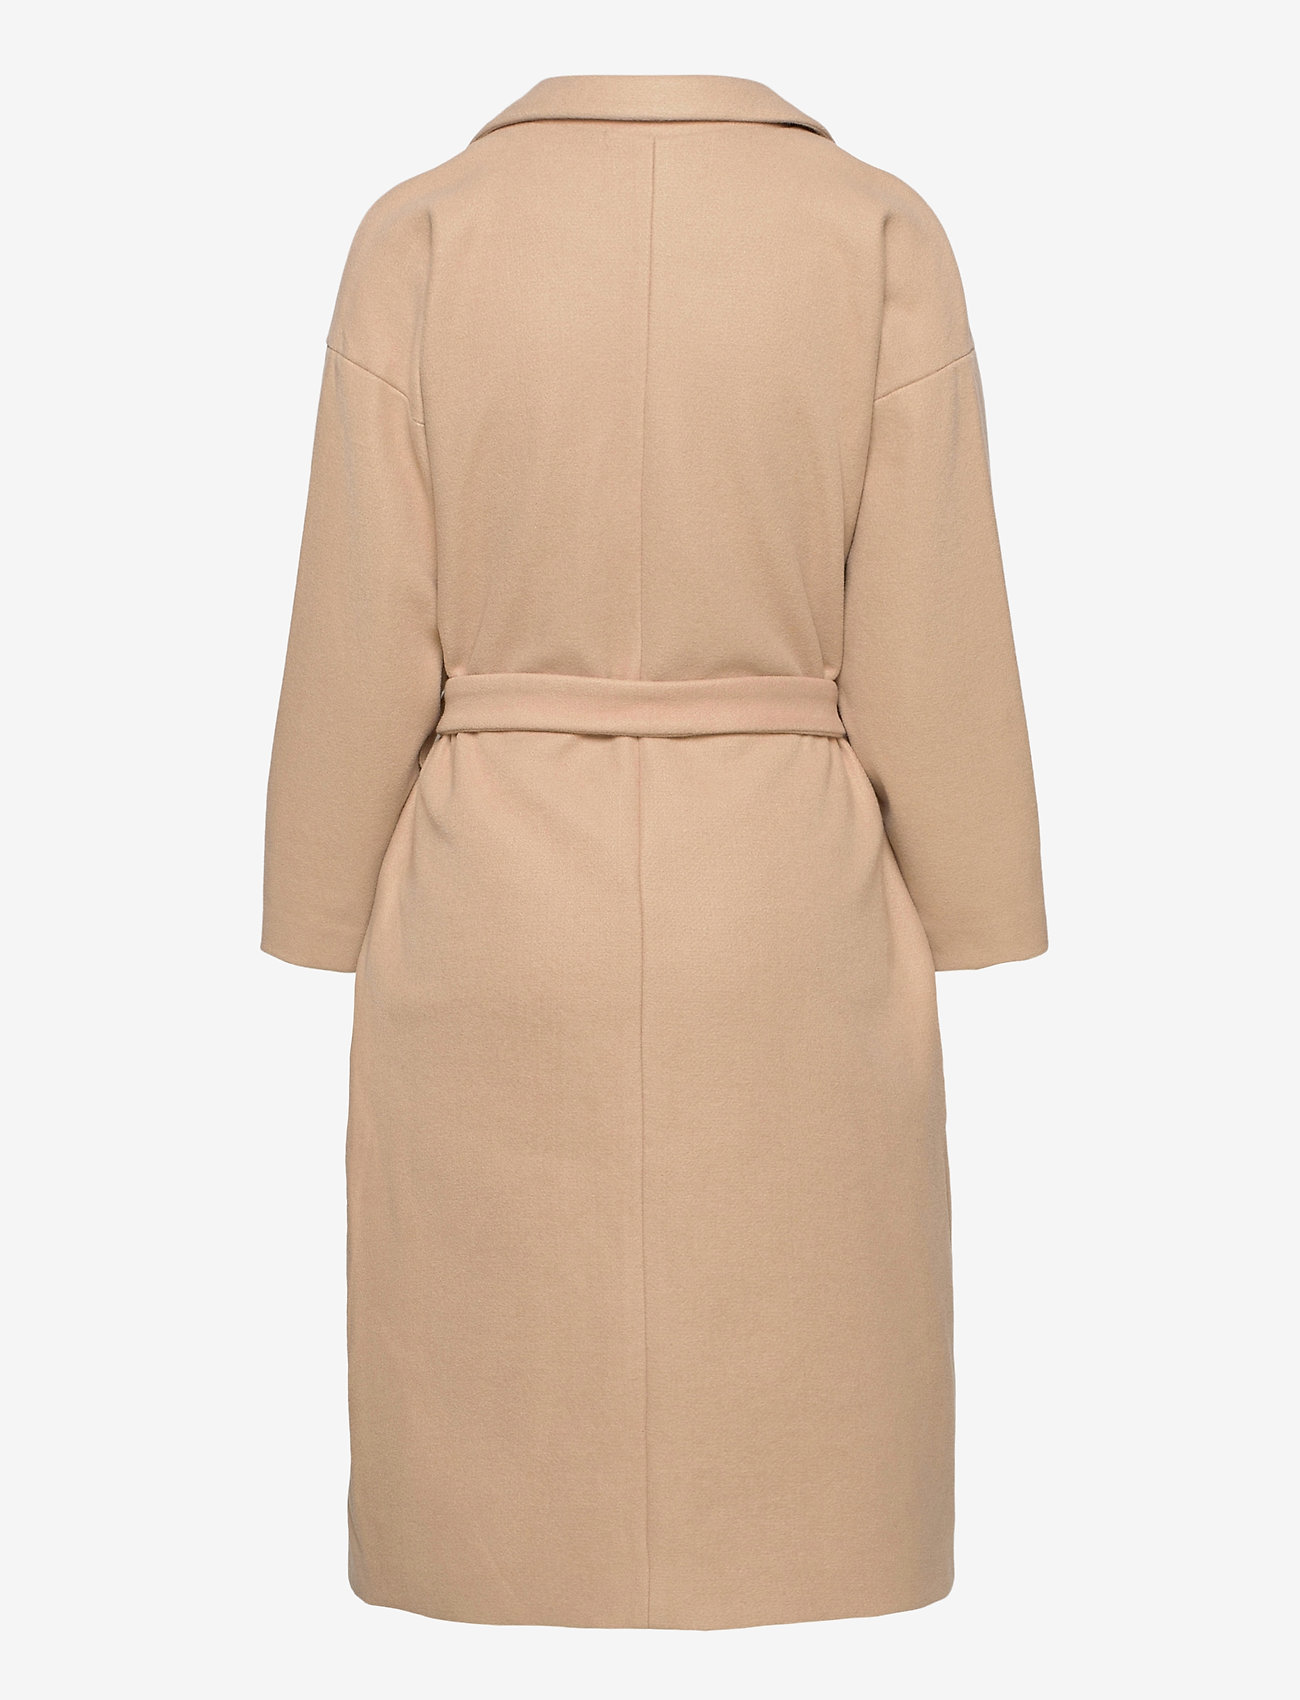 ICHI - IHJANNET JA2 - wool coats - natural - 1